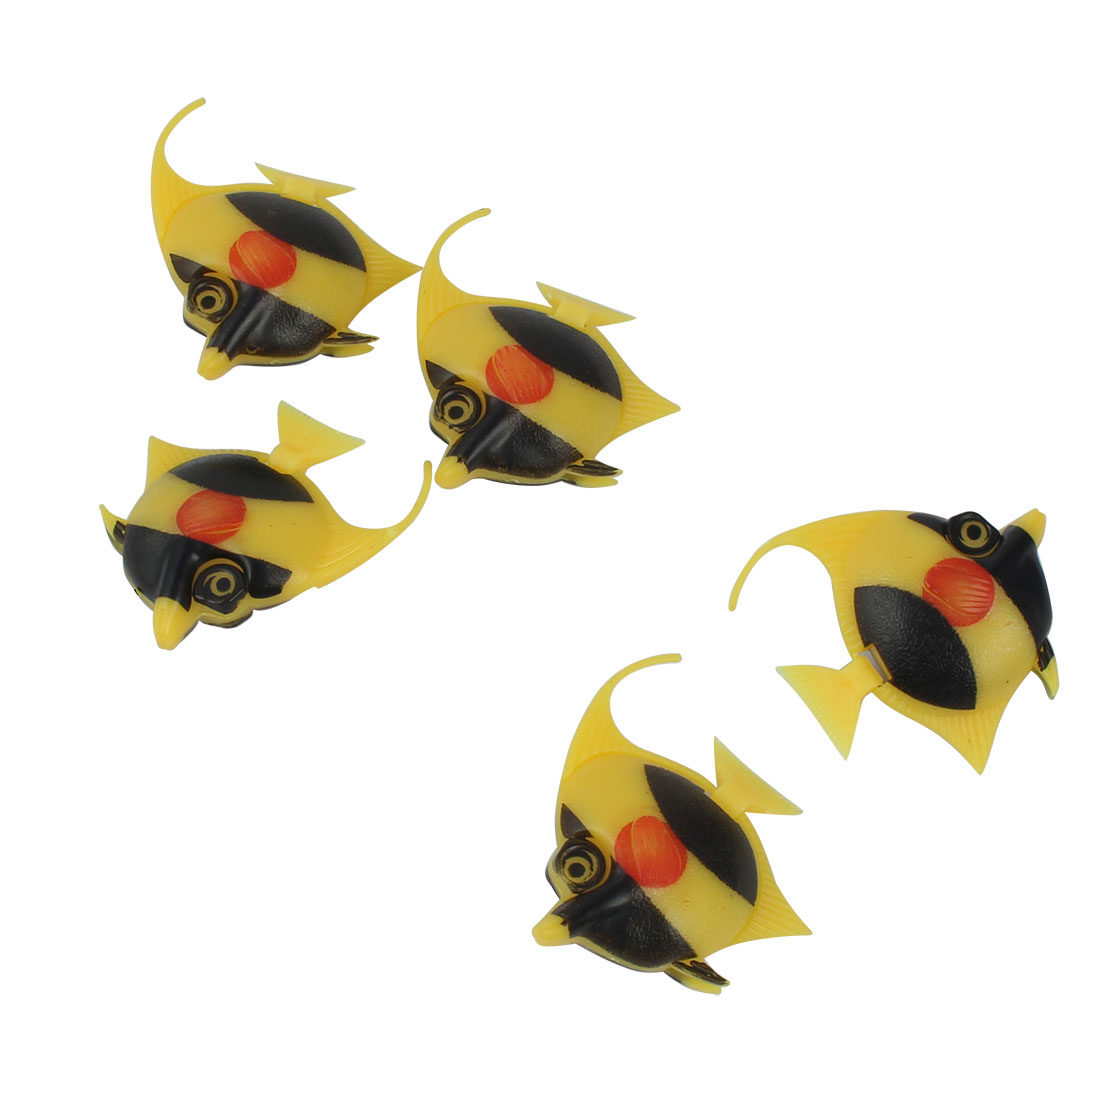 Aquarium Plastic Simulated Floating Fish Decoration Ornament Yellow Black 5pcs